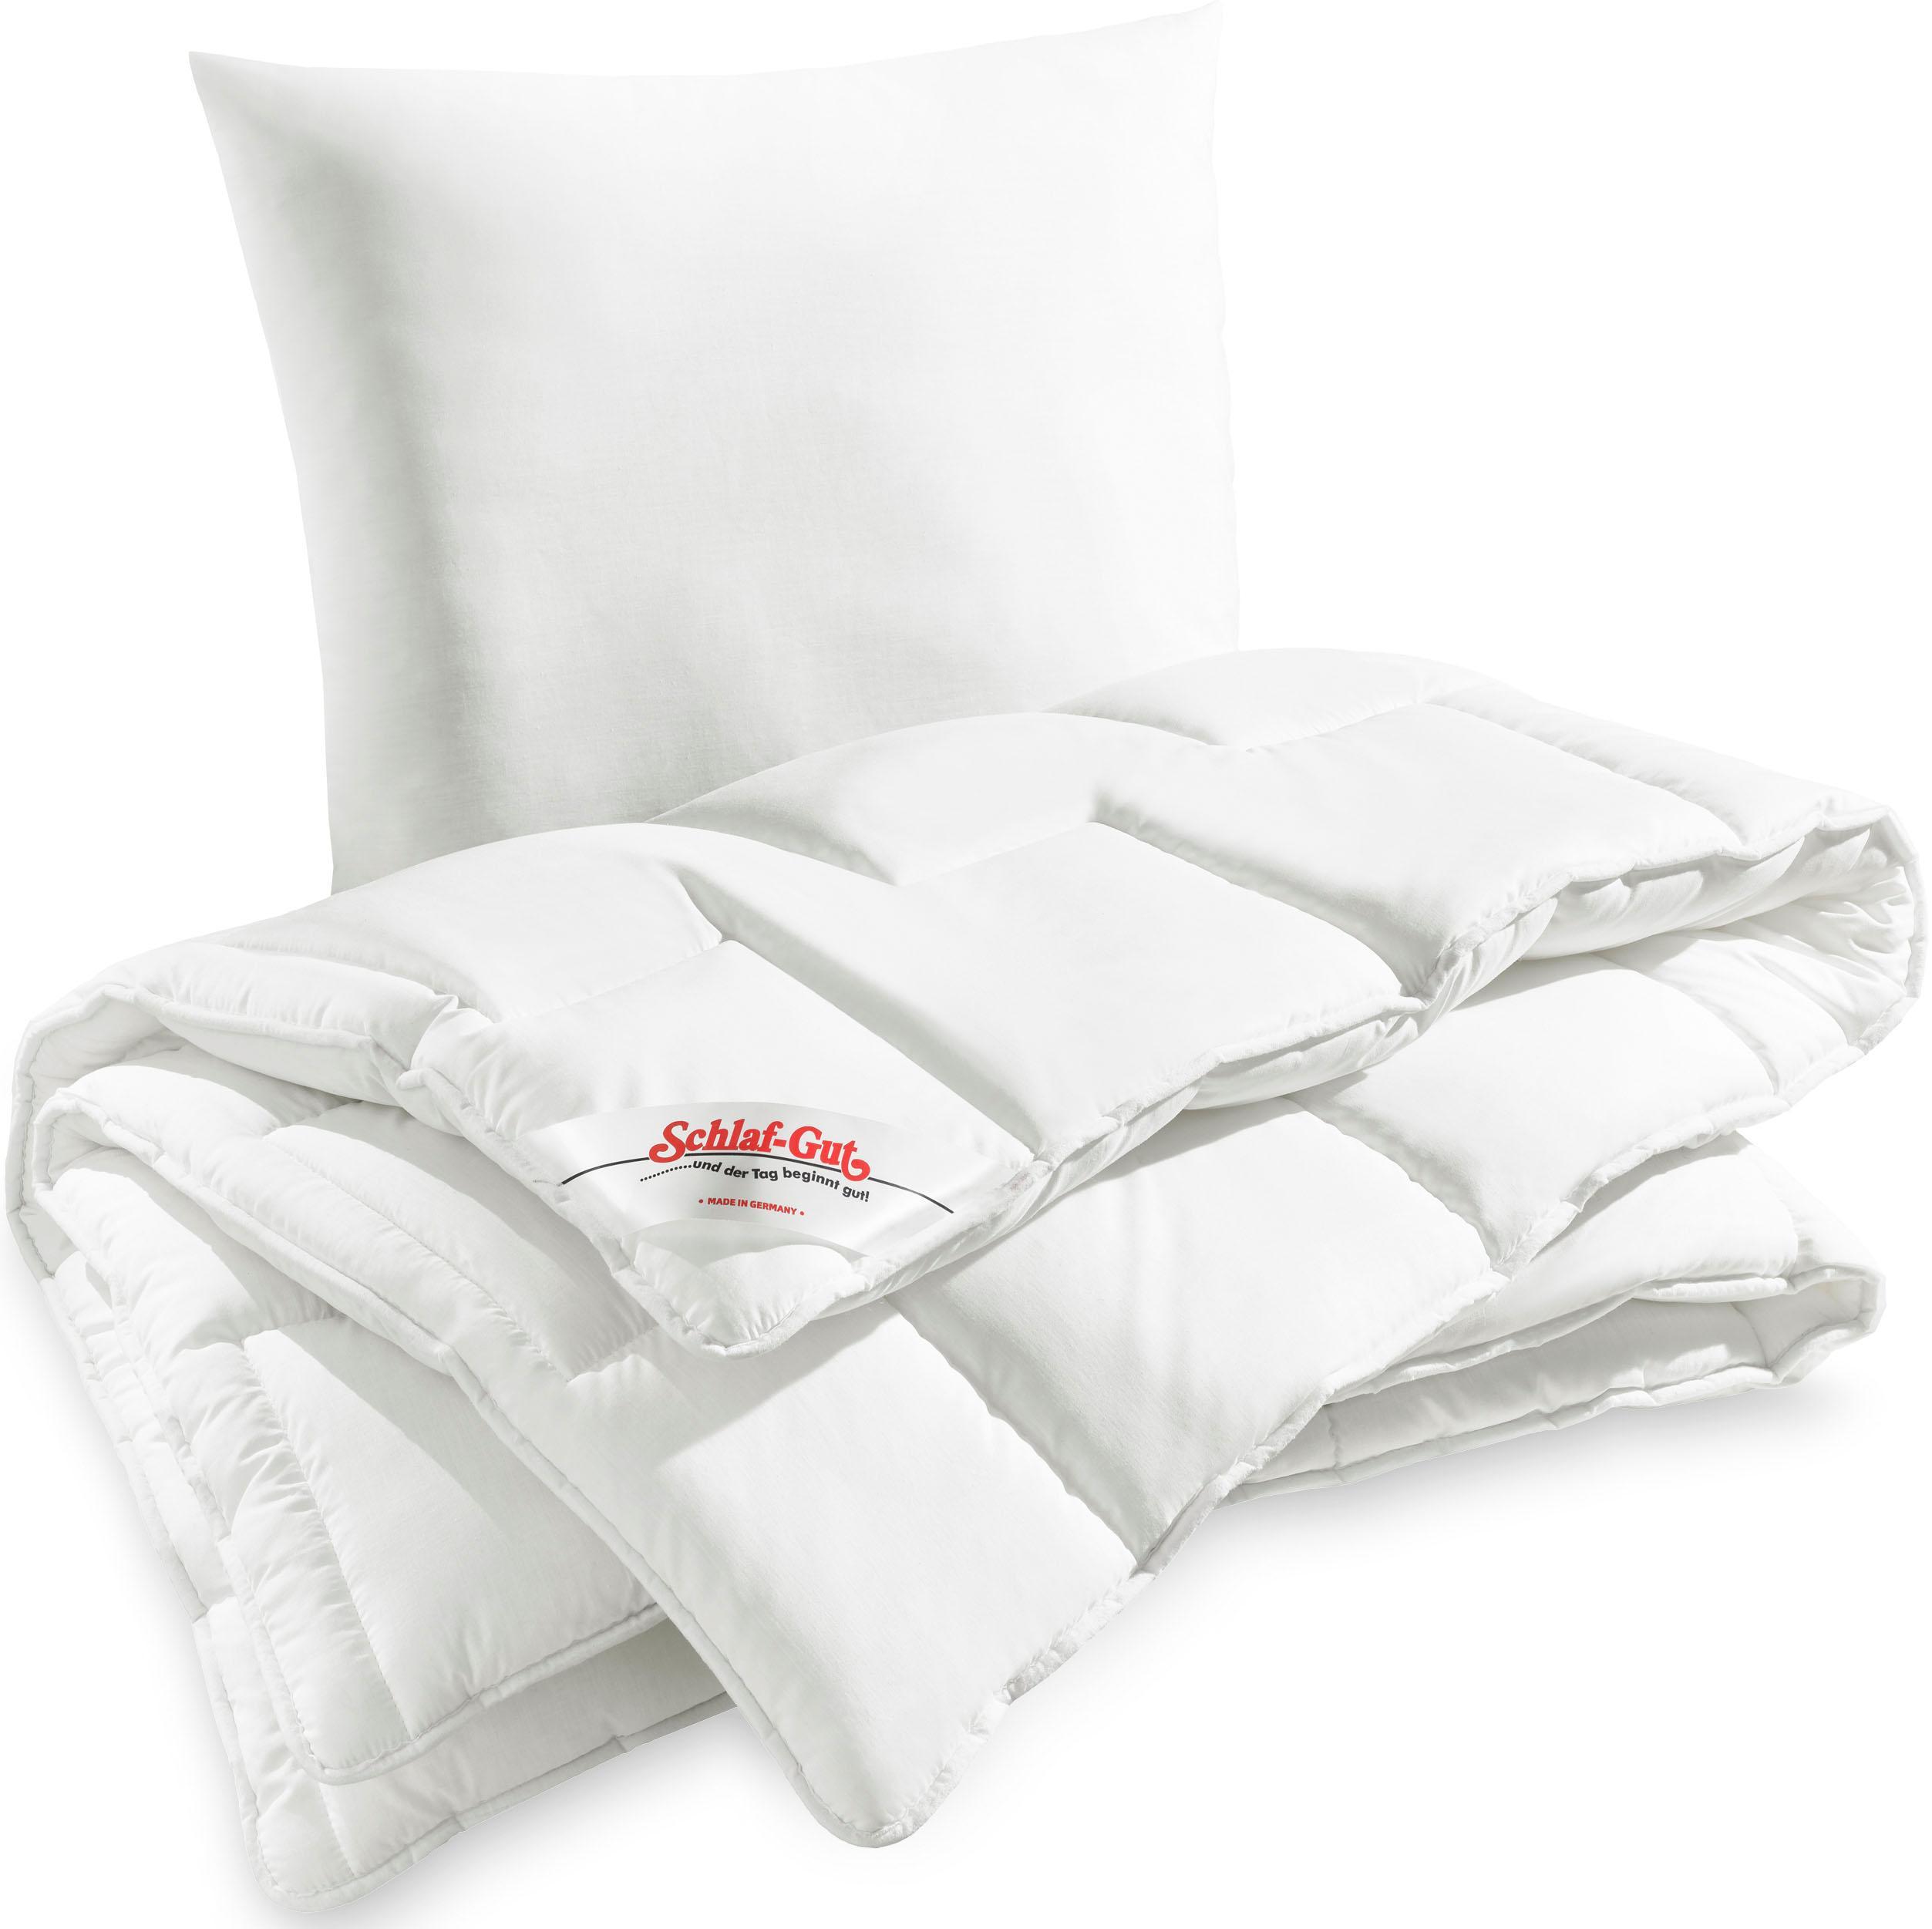 Bettdecke + Kopfkissen Utah Schlaf-Gut normal